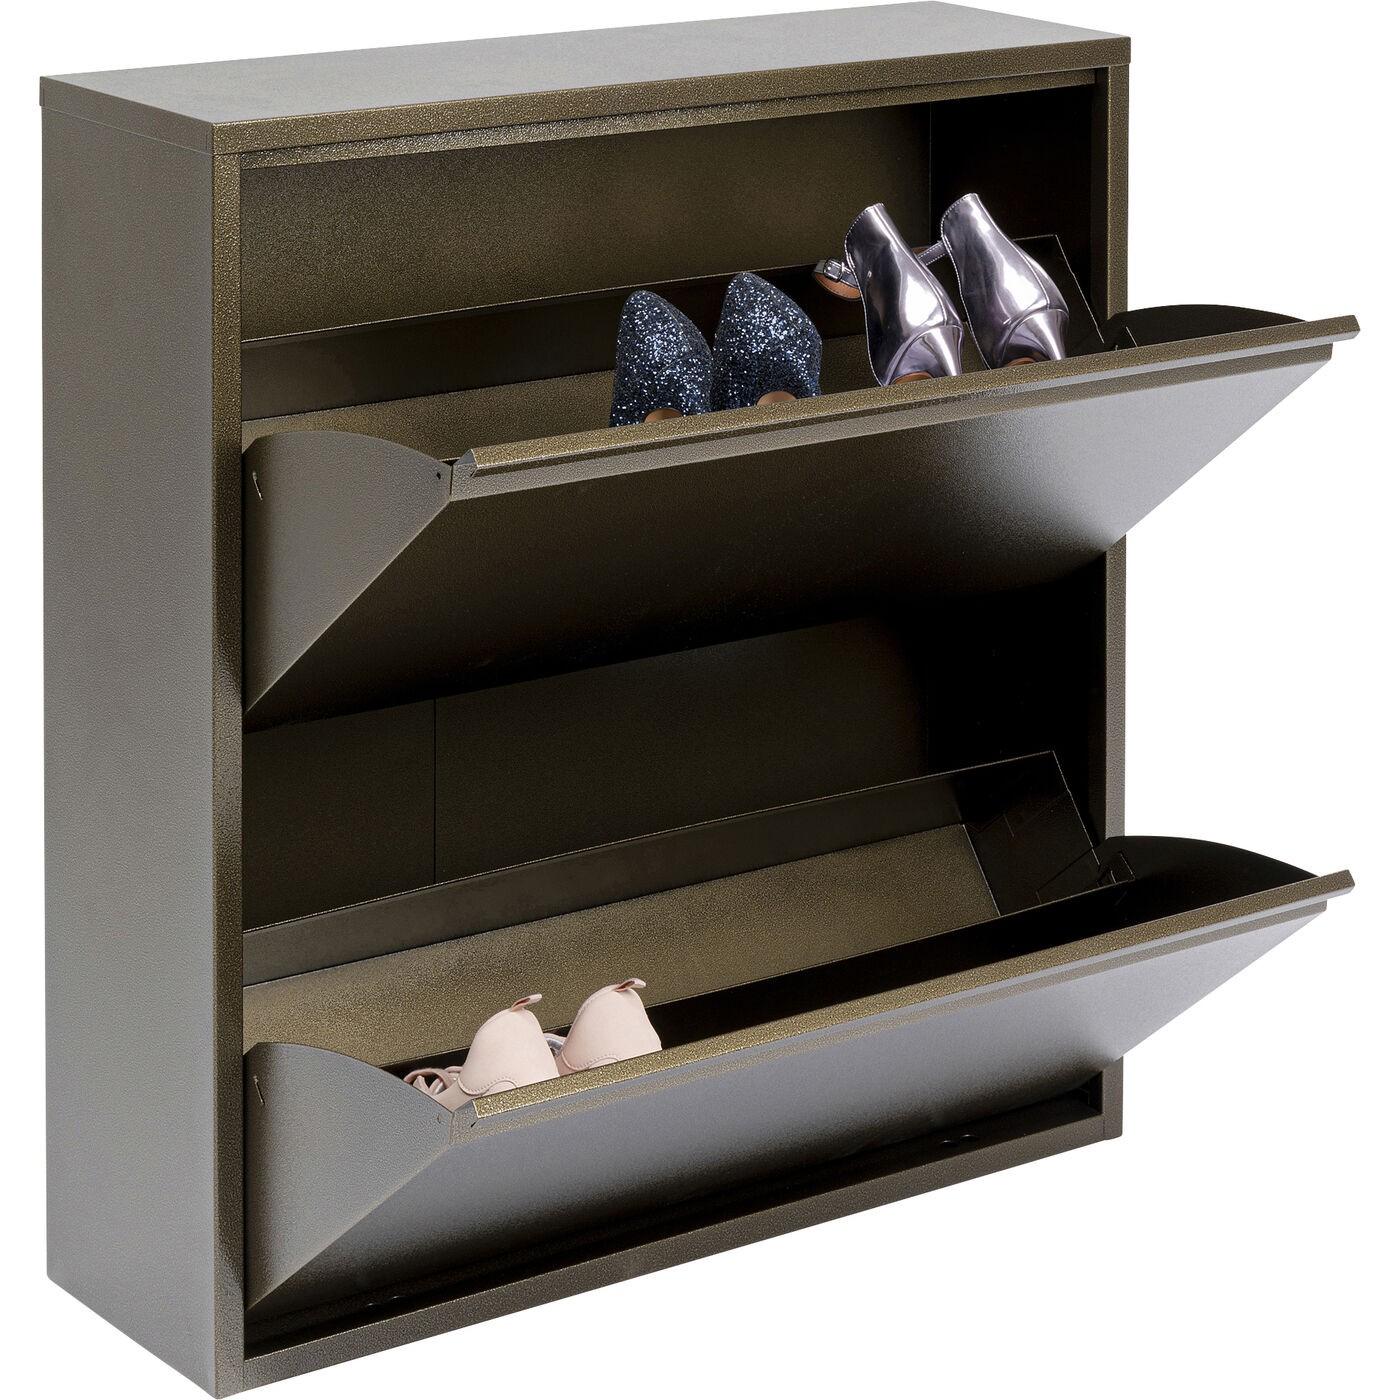 Casier à chaussures Caruso bronze 2 tiroirs Kare Design